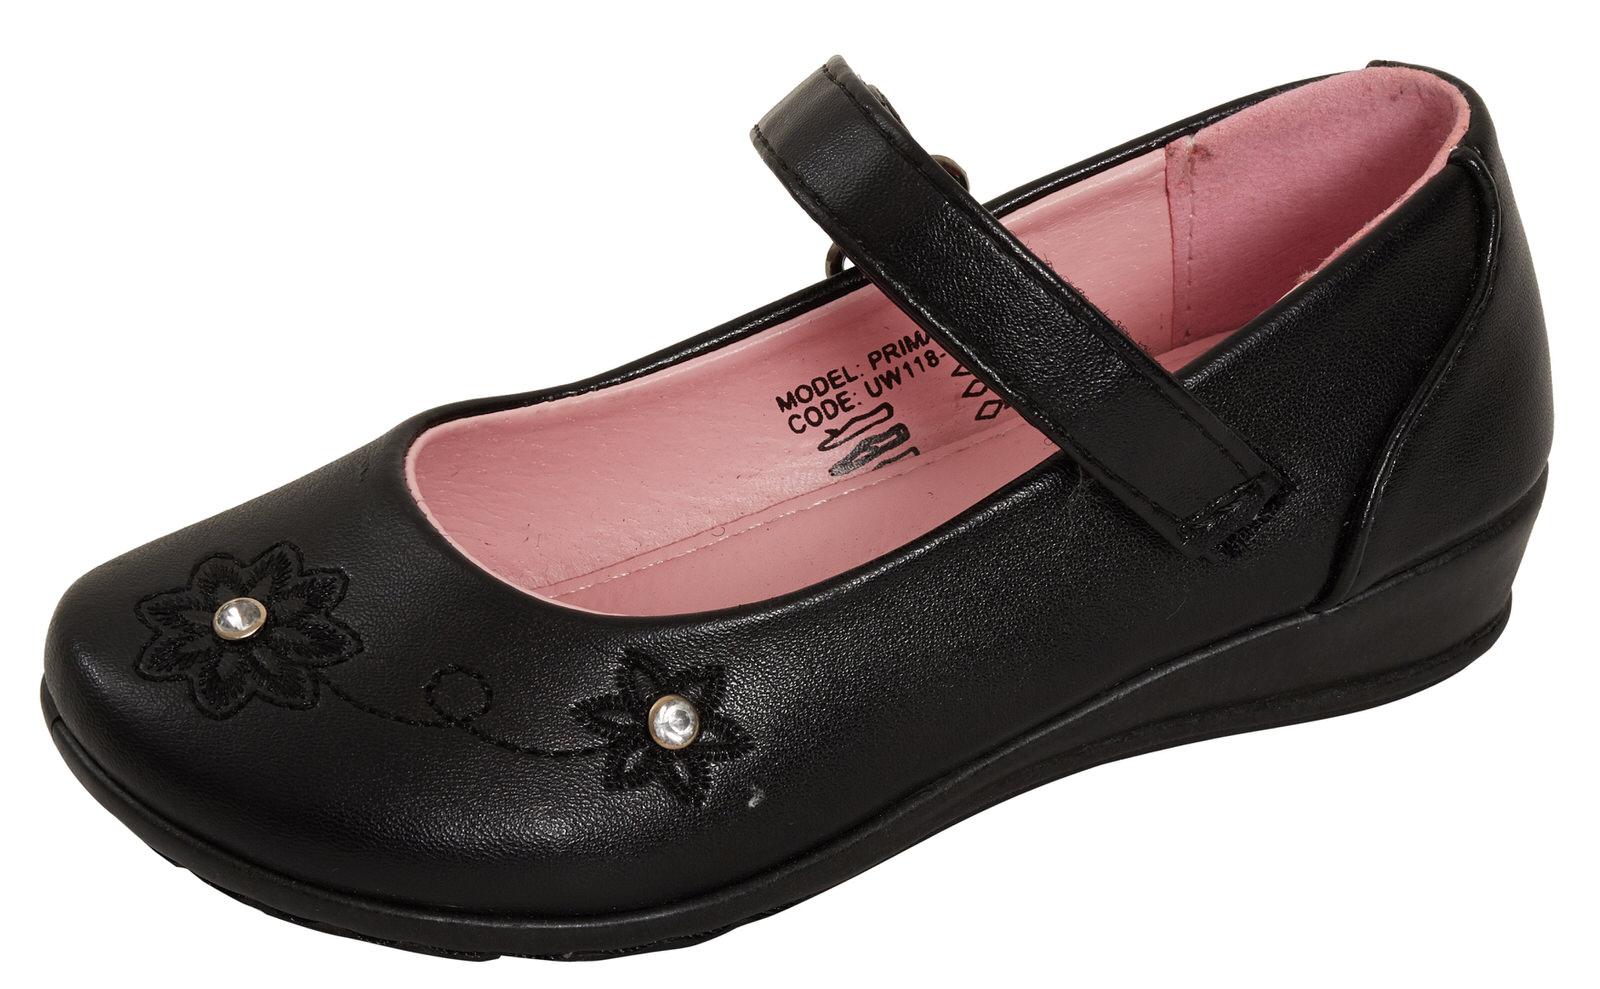 Filles En Cuir Synthétique Noir School Shoes Kids Mary Jane PU PATENT Flat Party Chaussures